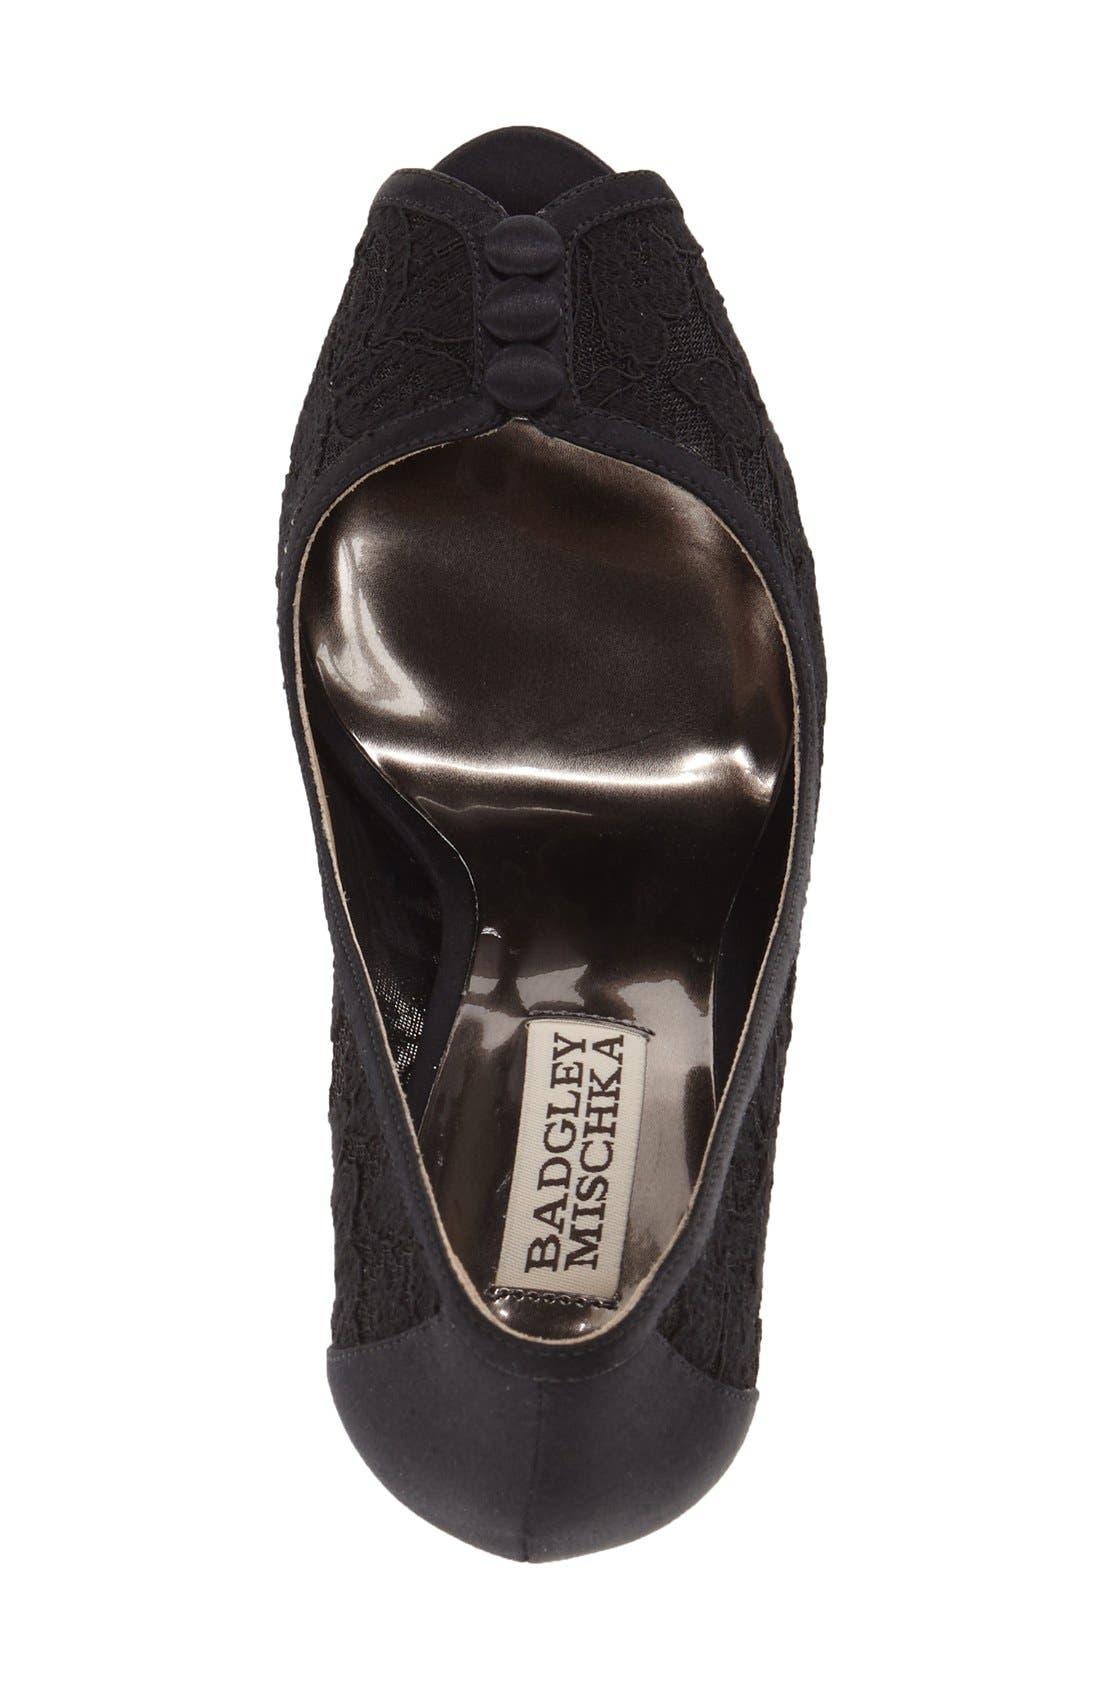 Alternate Image 3  - Badgley Mischka 'Nerissa' Lace Peep Toe Pump (Women)